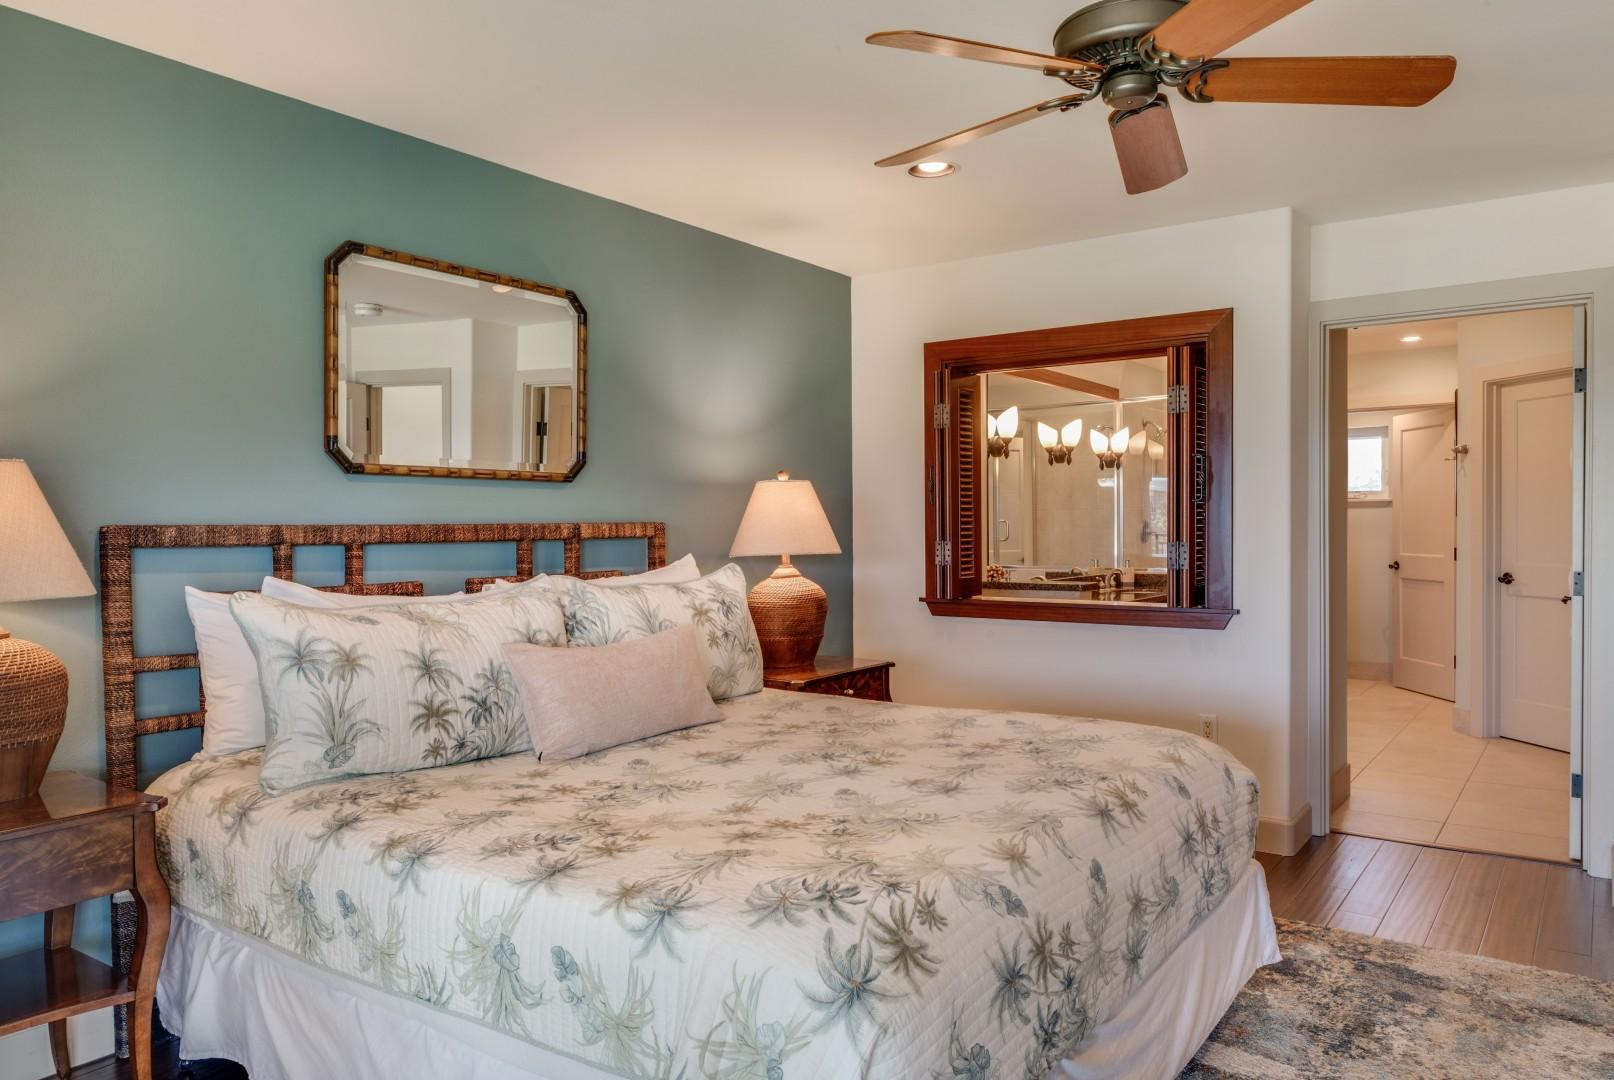 Master bedroom w/ spacious ensuite bath & peek-a-boo window